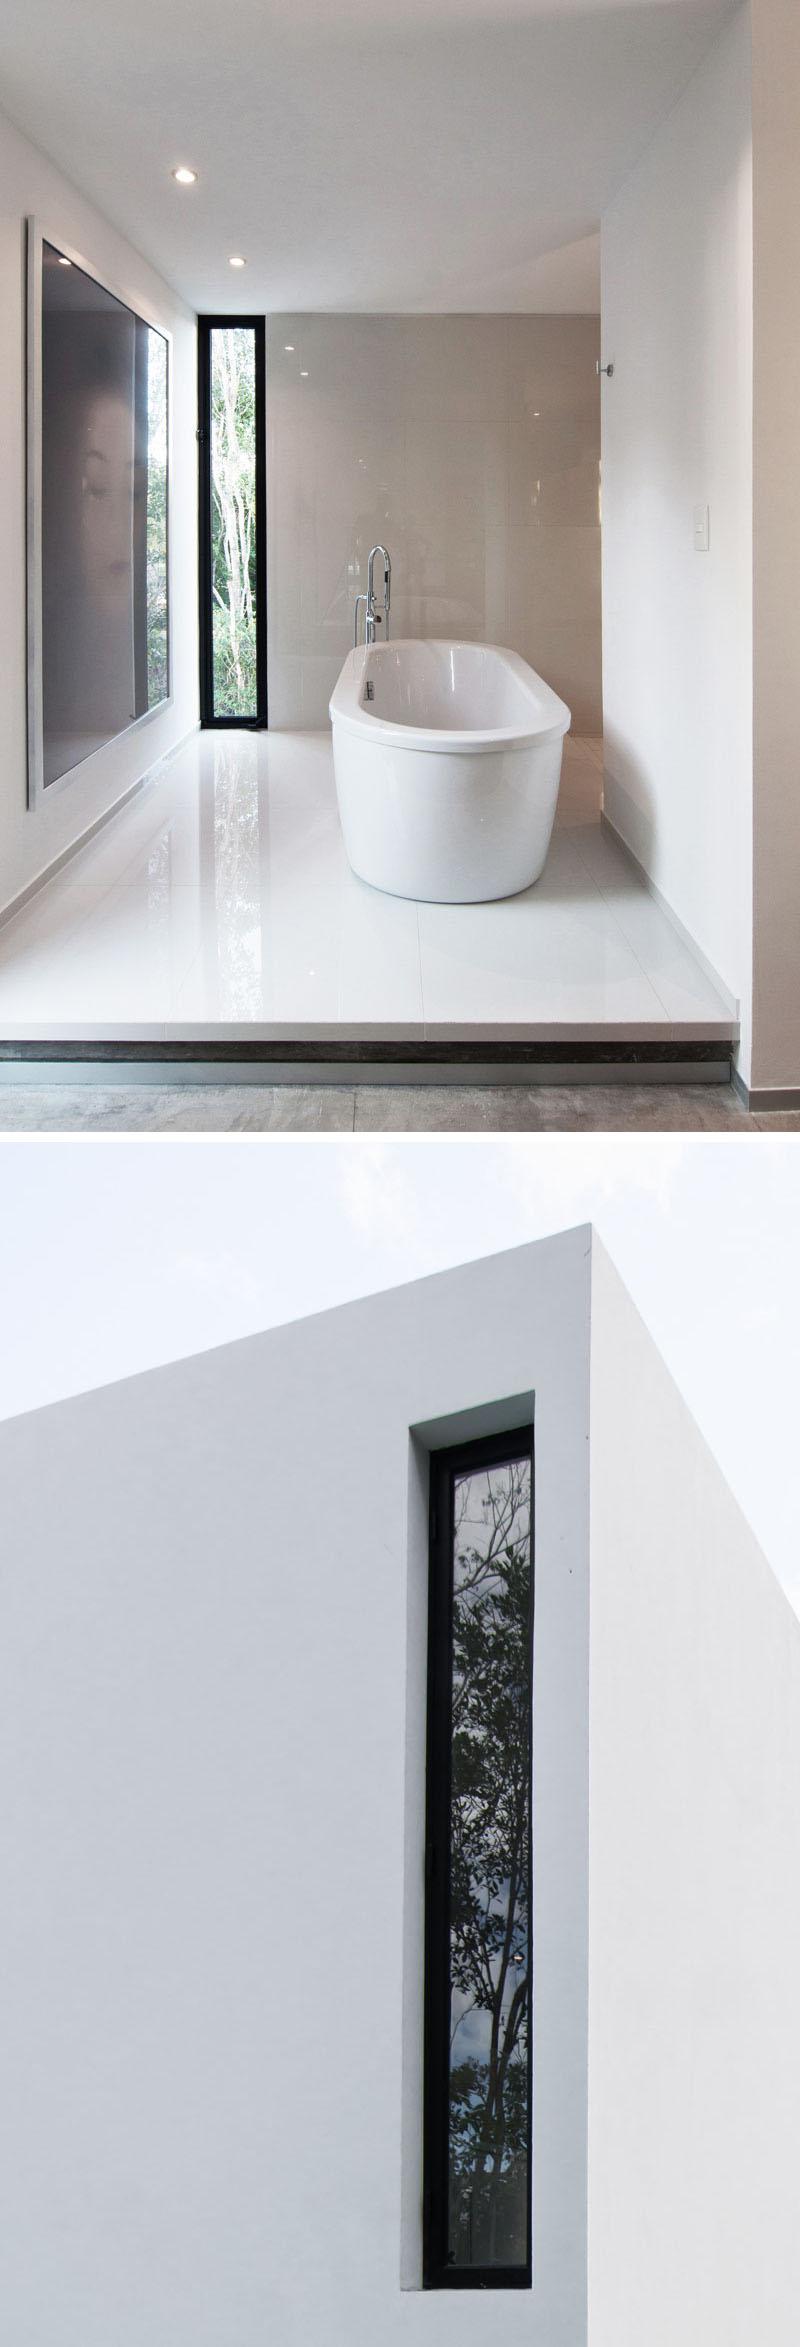 dizajn prozora